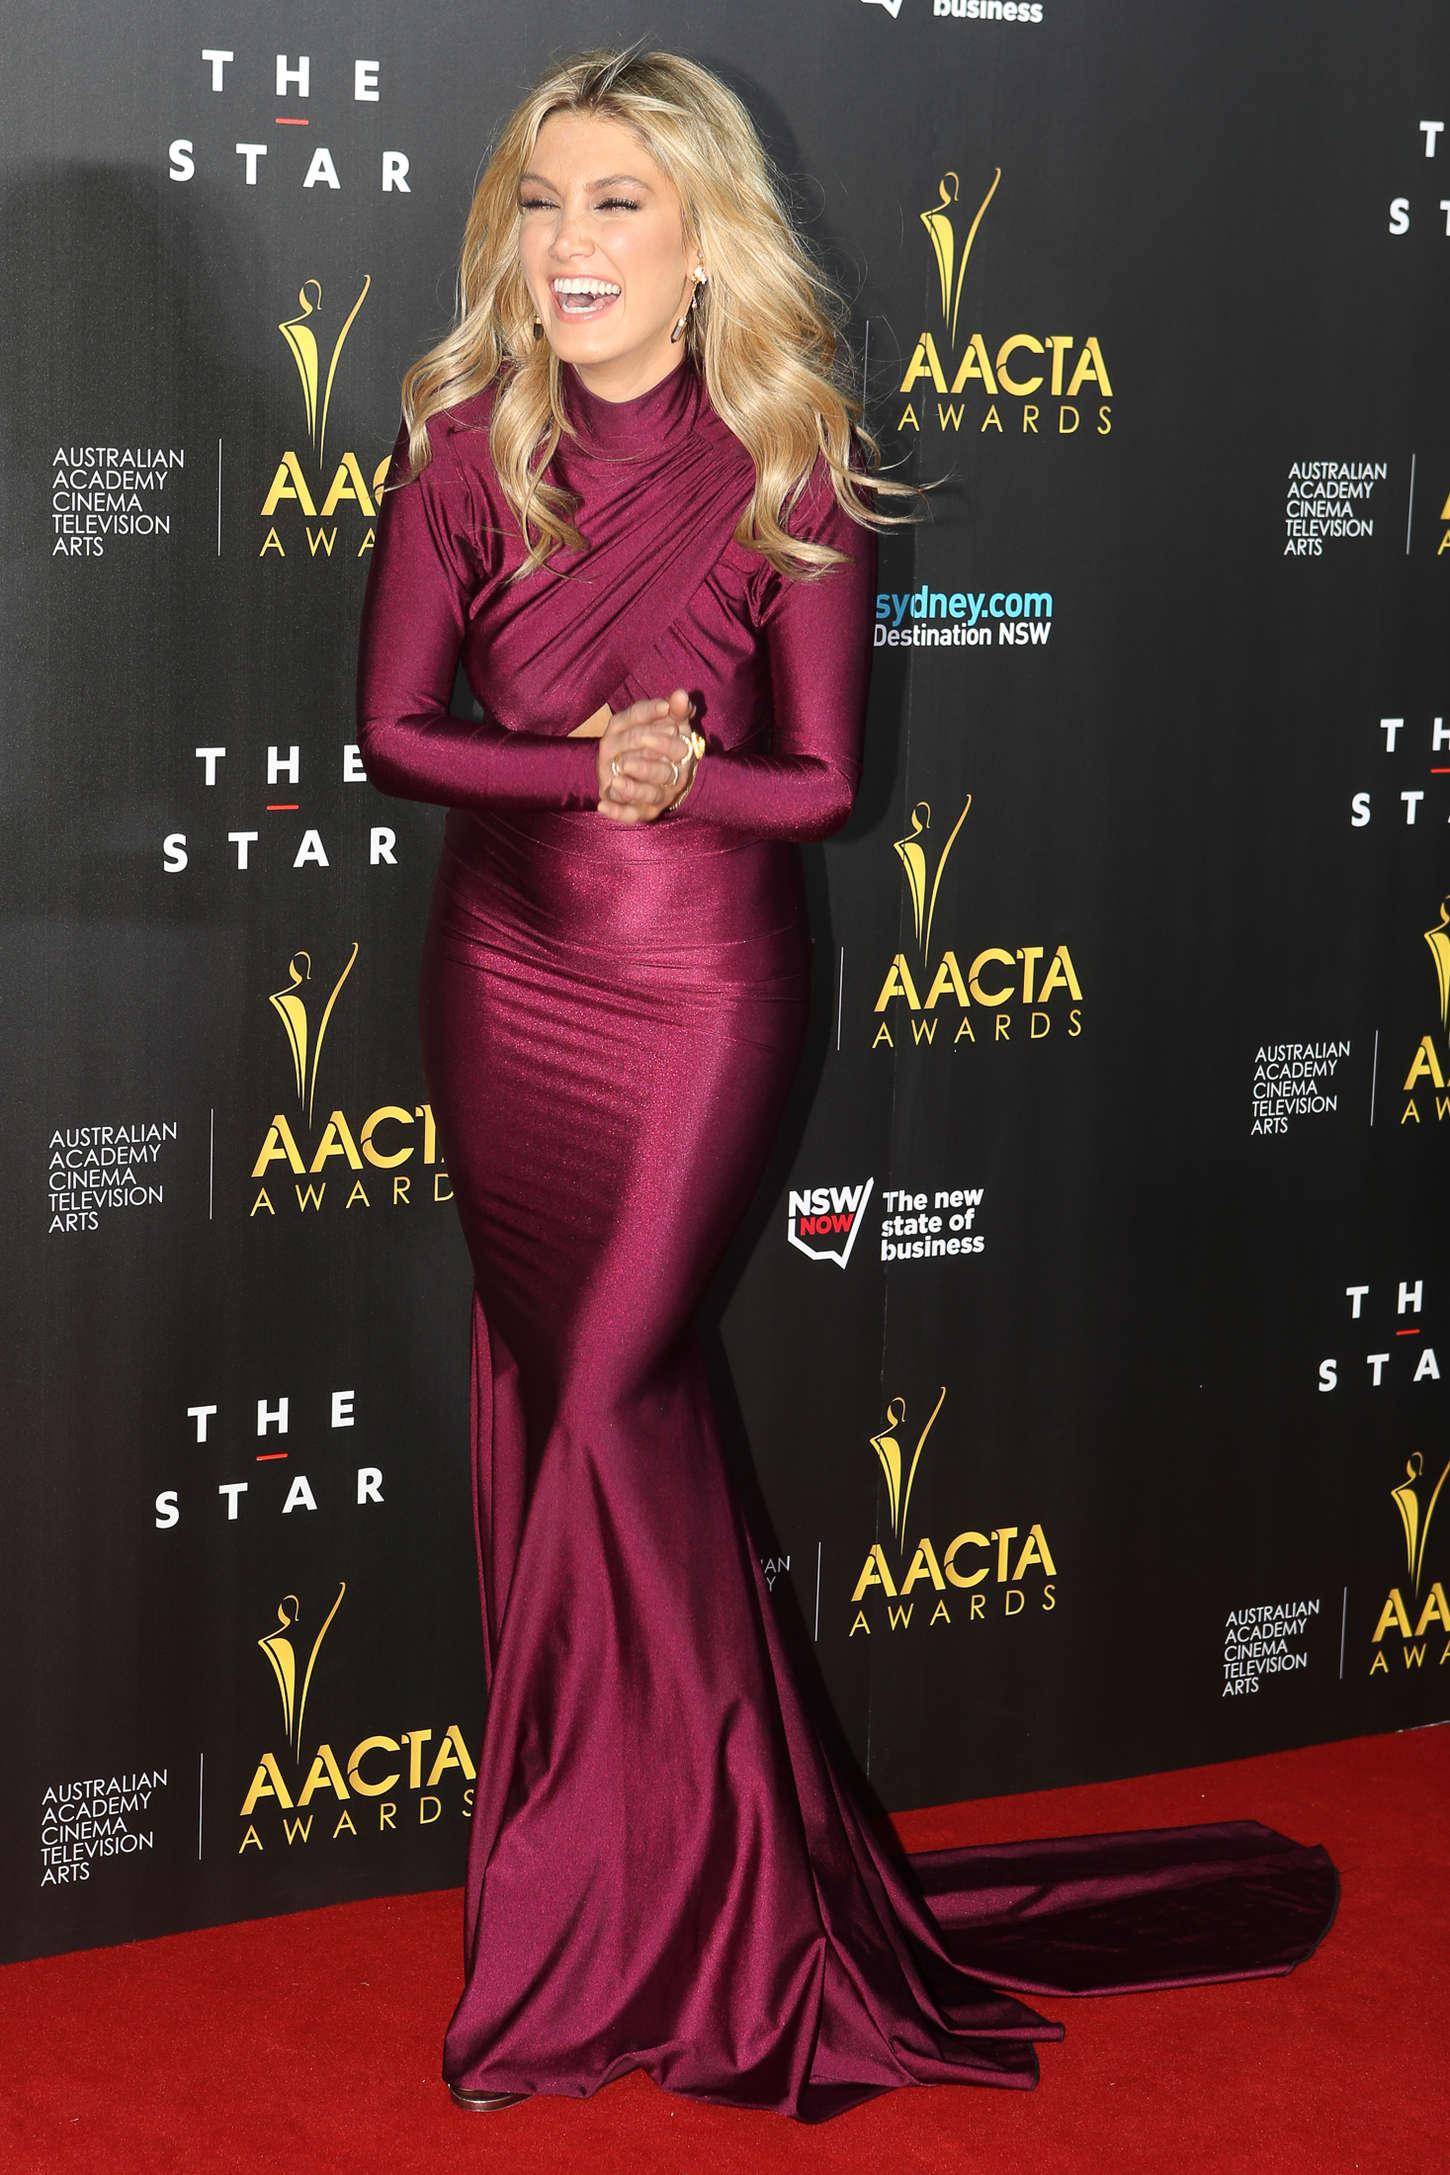 aacta awards - photo #14